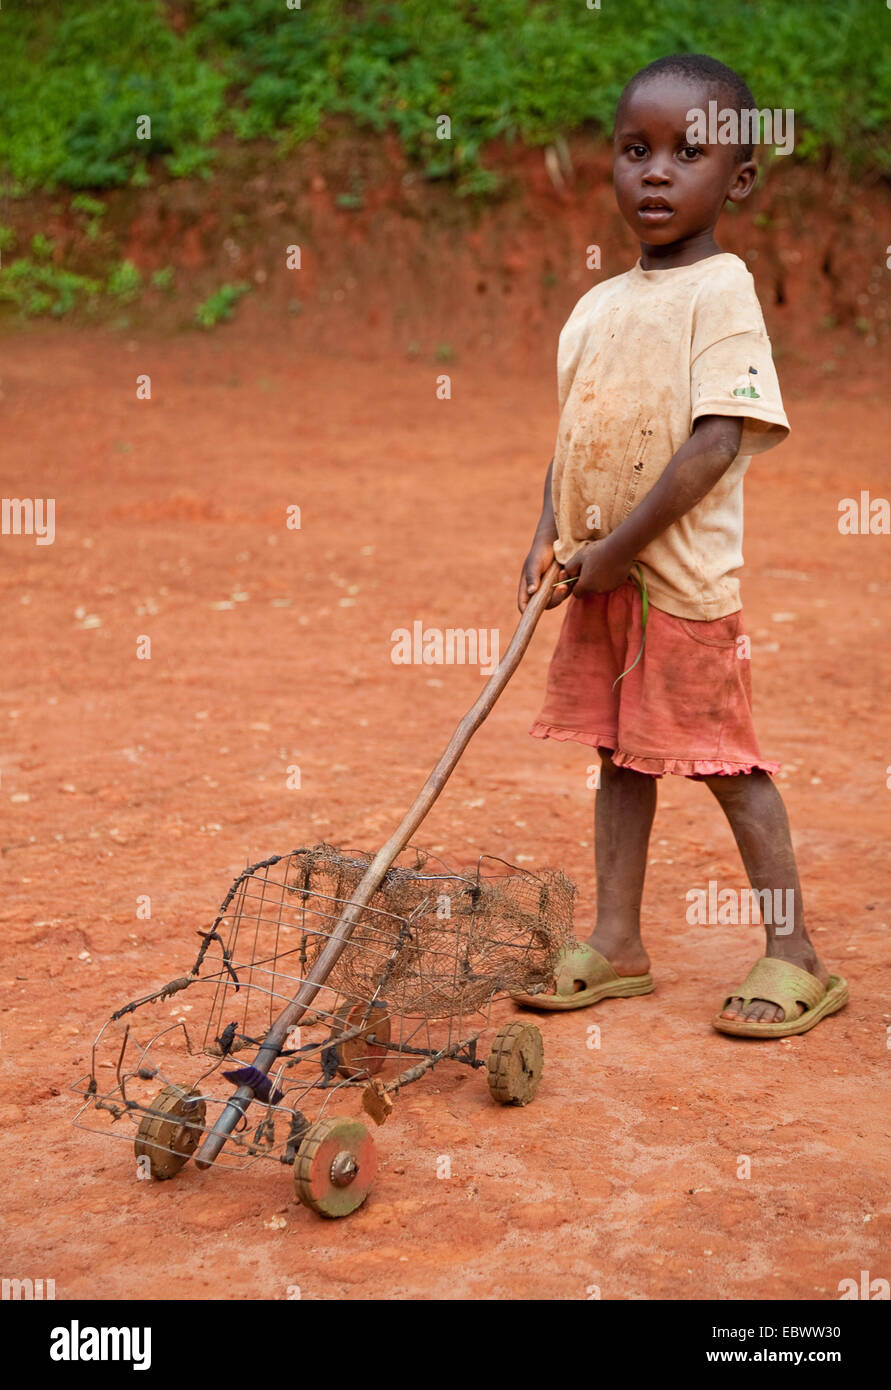 Garçon jouant avec selfmade wire frame petite voiture Gitega, Burundi, Photo Stock